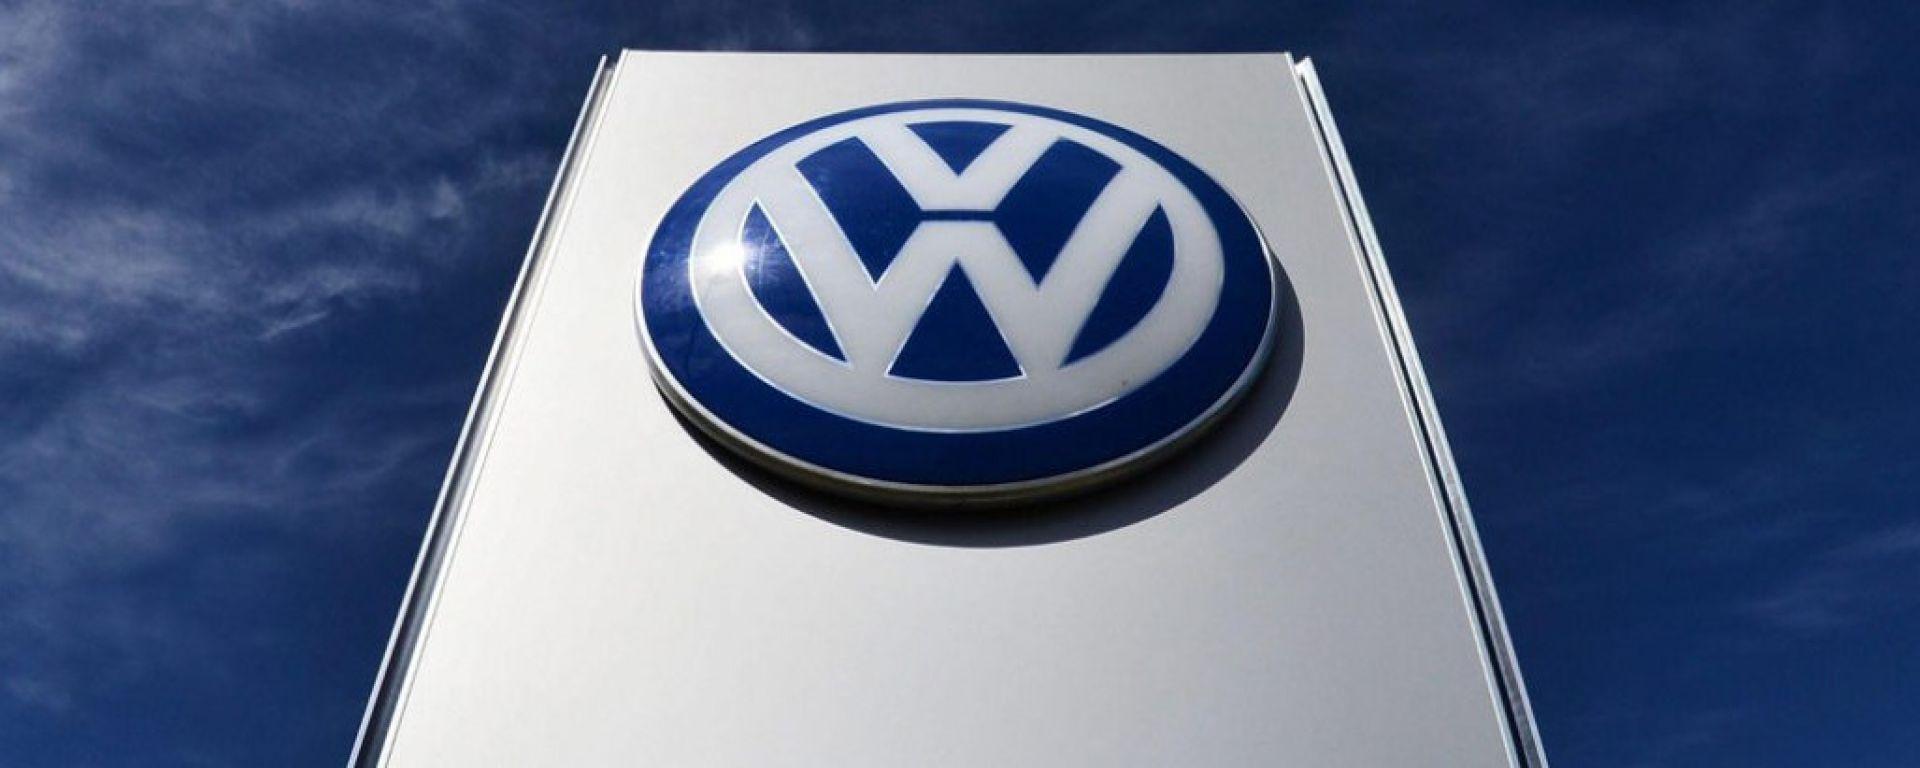 Dieselgate Volkswagen, via alla maxi class action